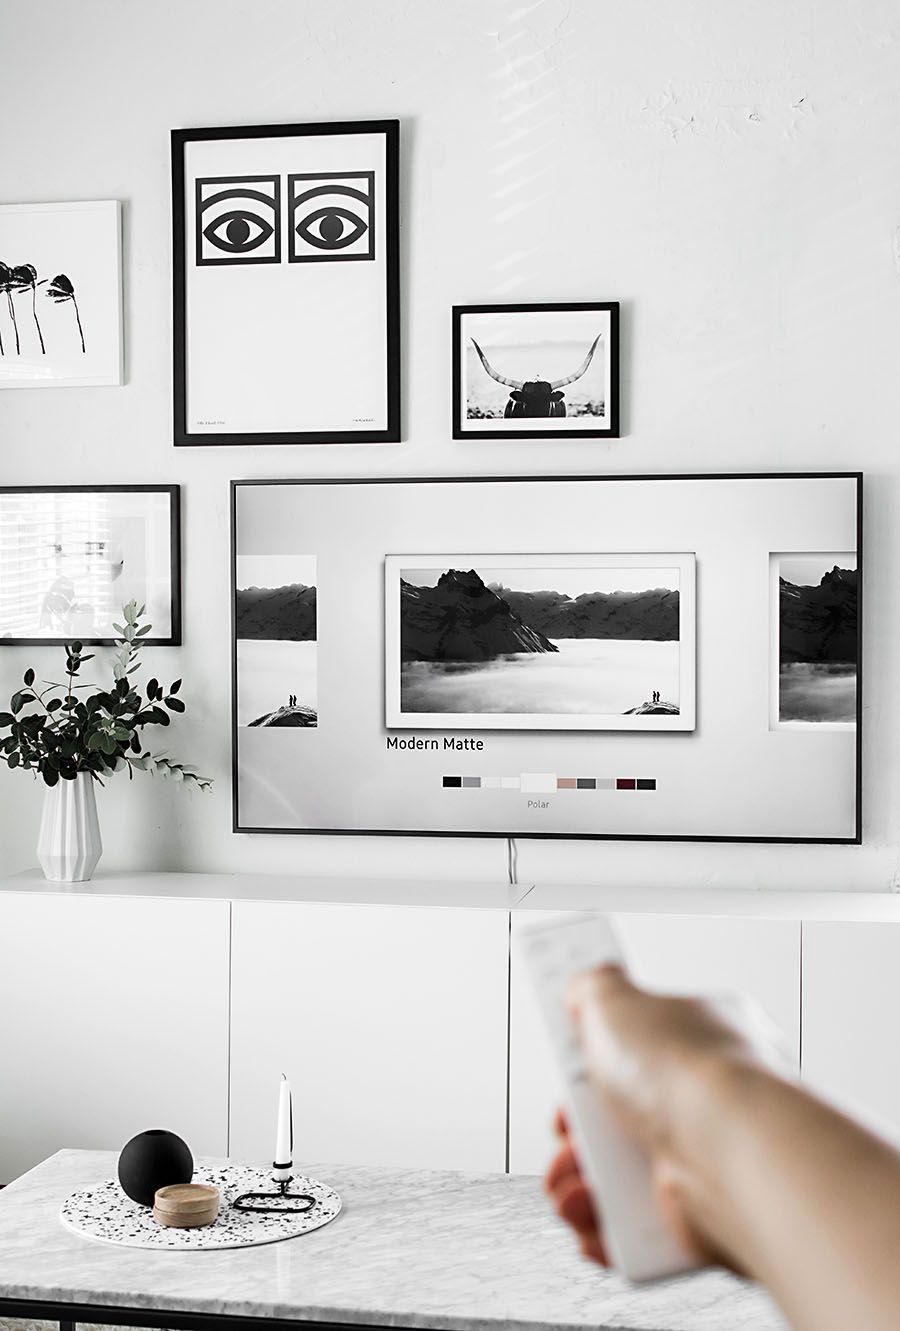 Gallery Wall Update A Tv That Matches Our Decor Gallery Wall  # Pan De Mur Avec Tv